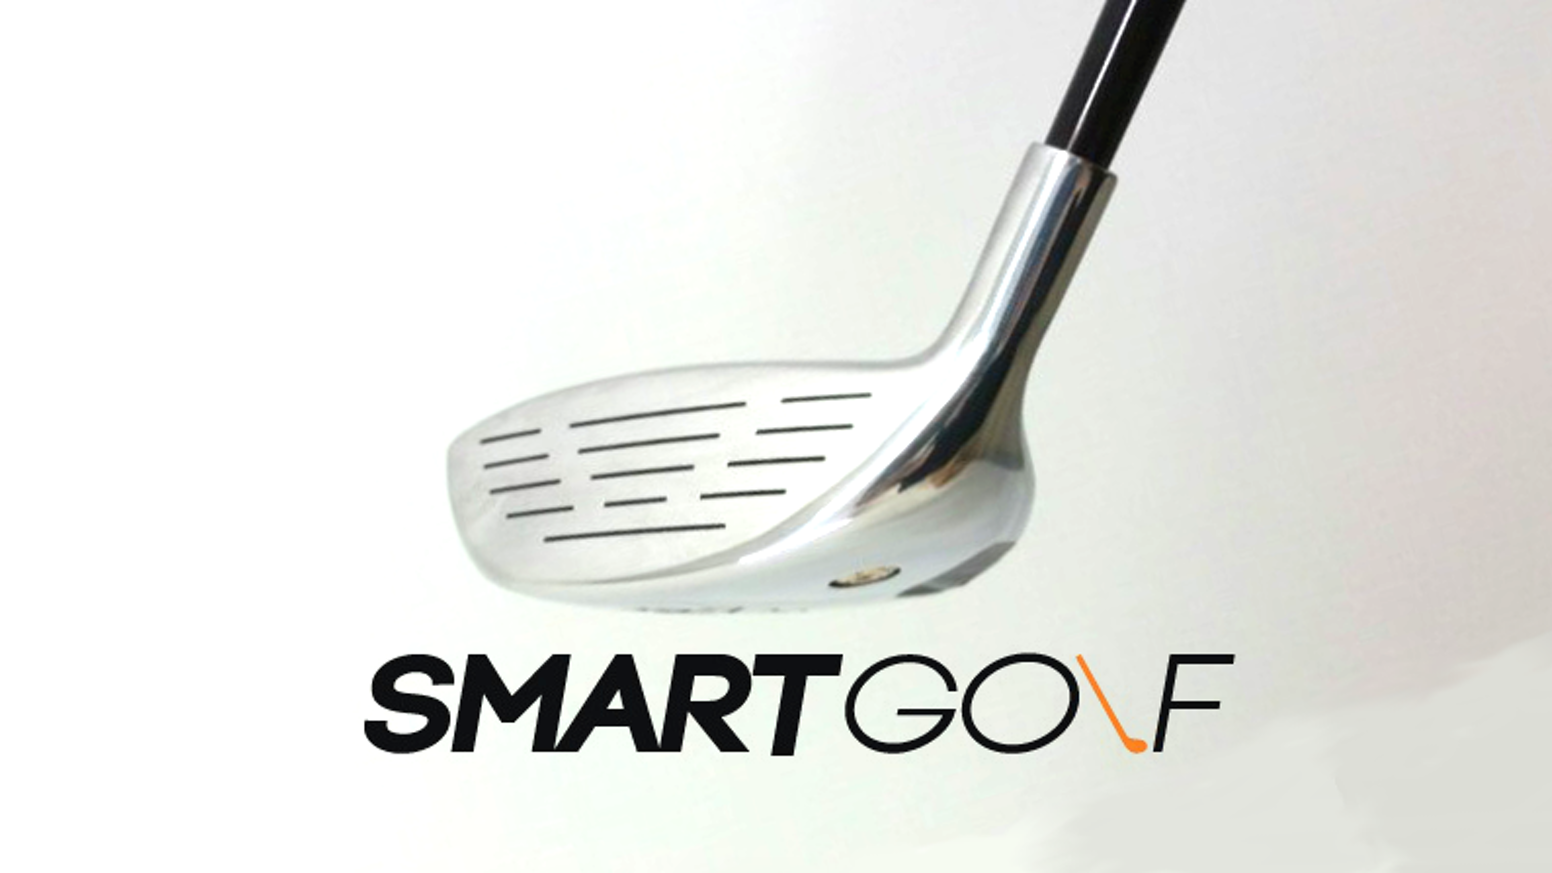 0937b0d4fd SMARTGOLF is a Wi-Fi compatible Smart Golf club, bringing you a realistic  training